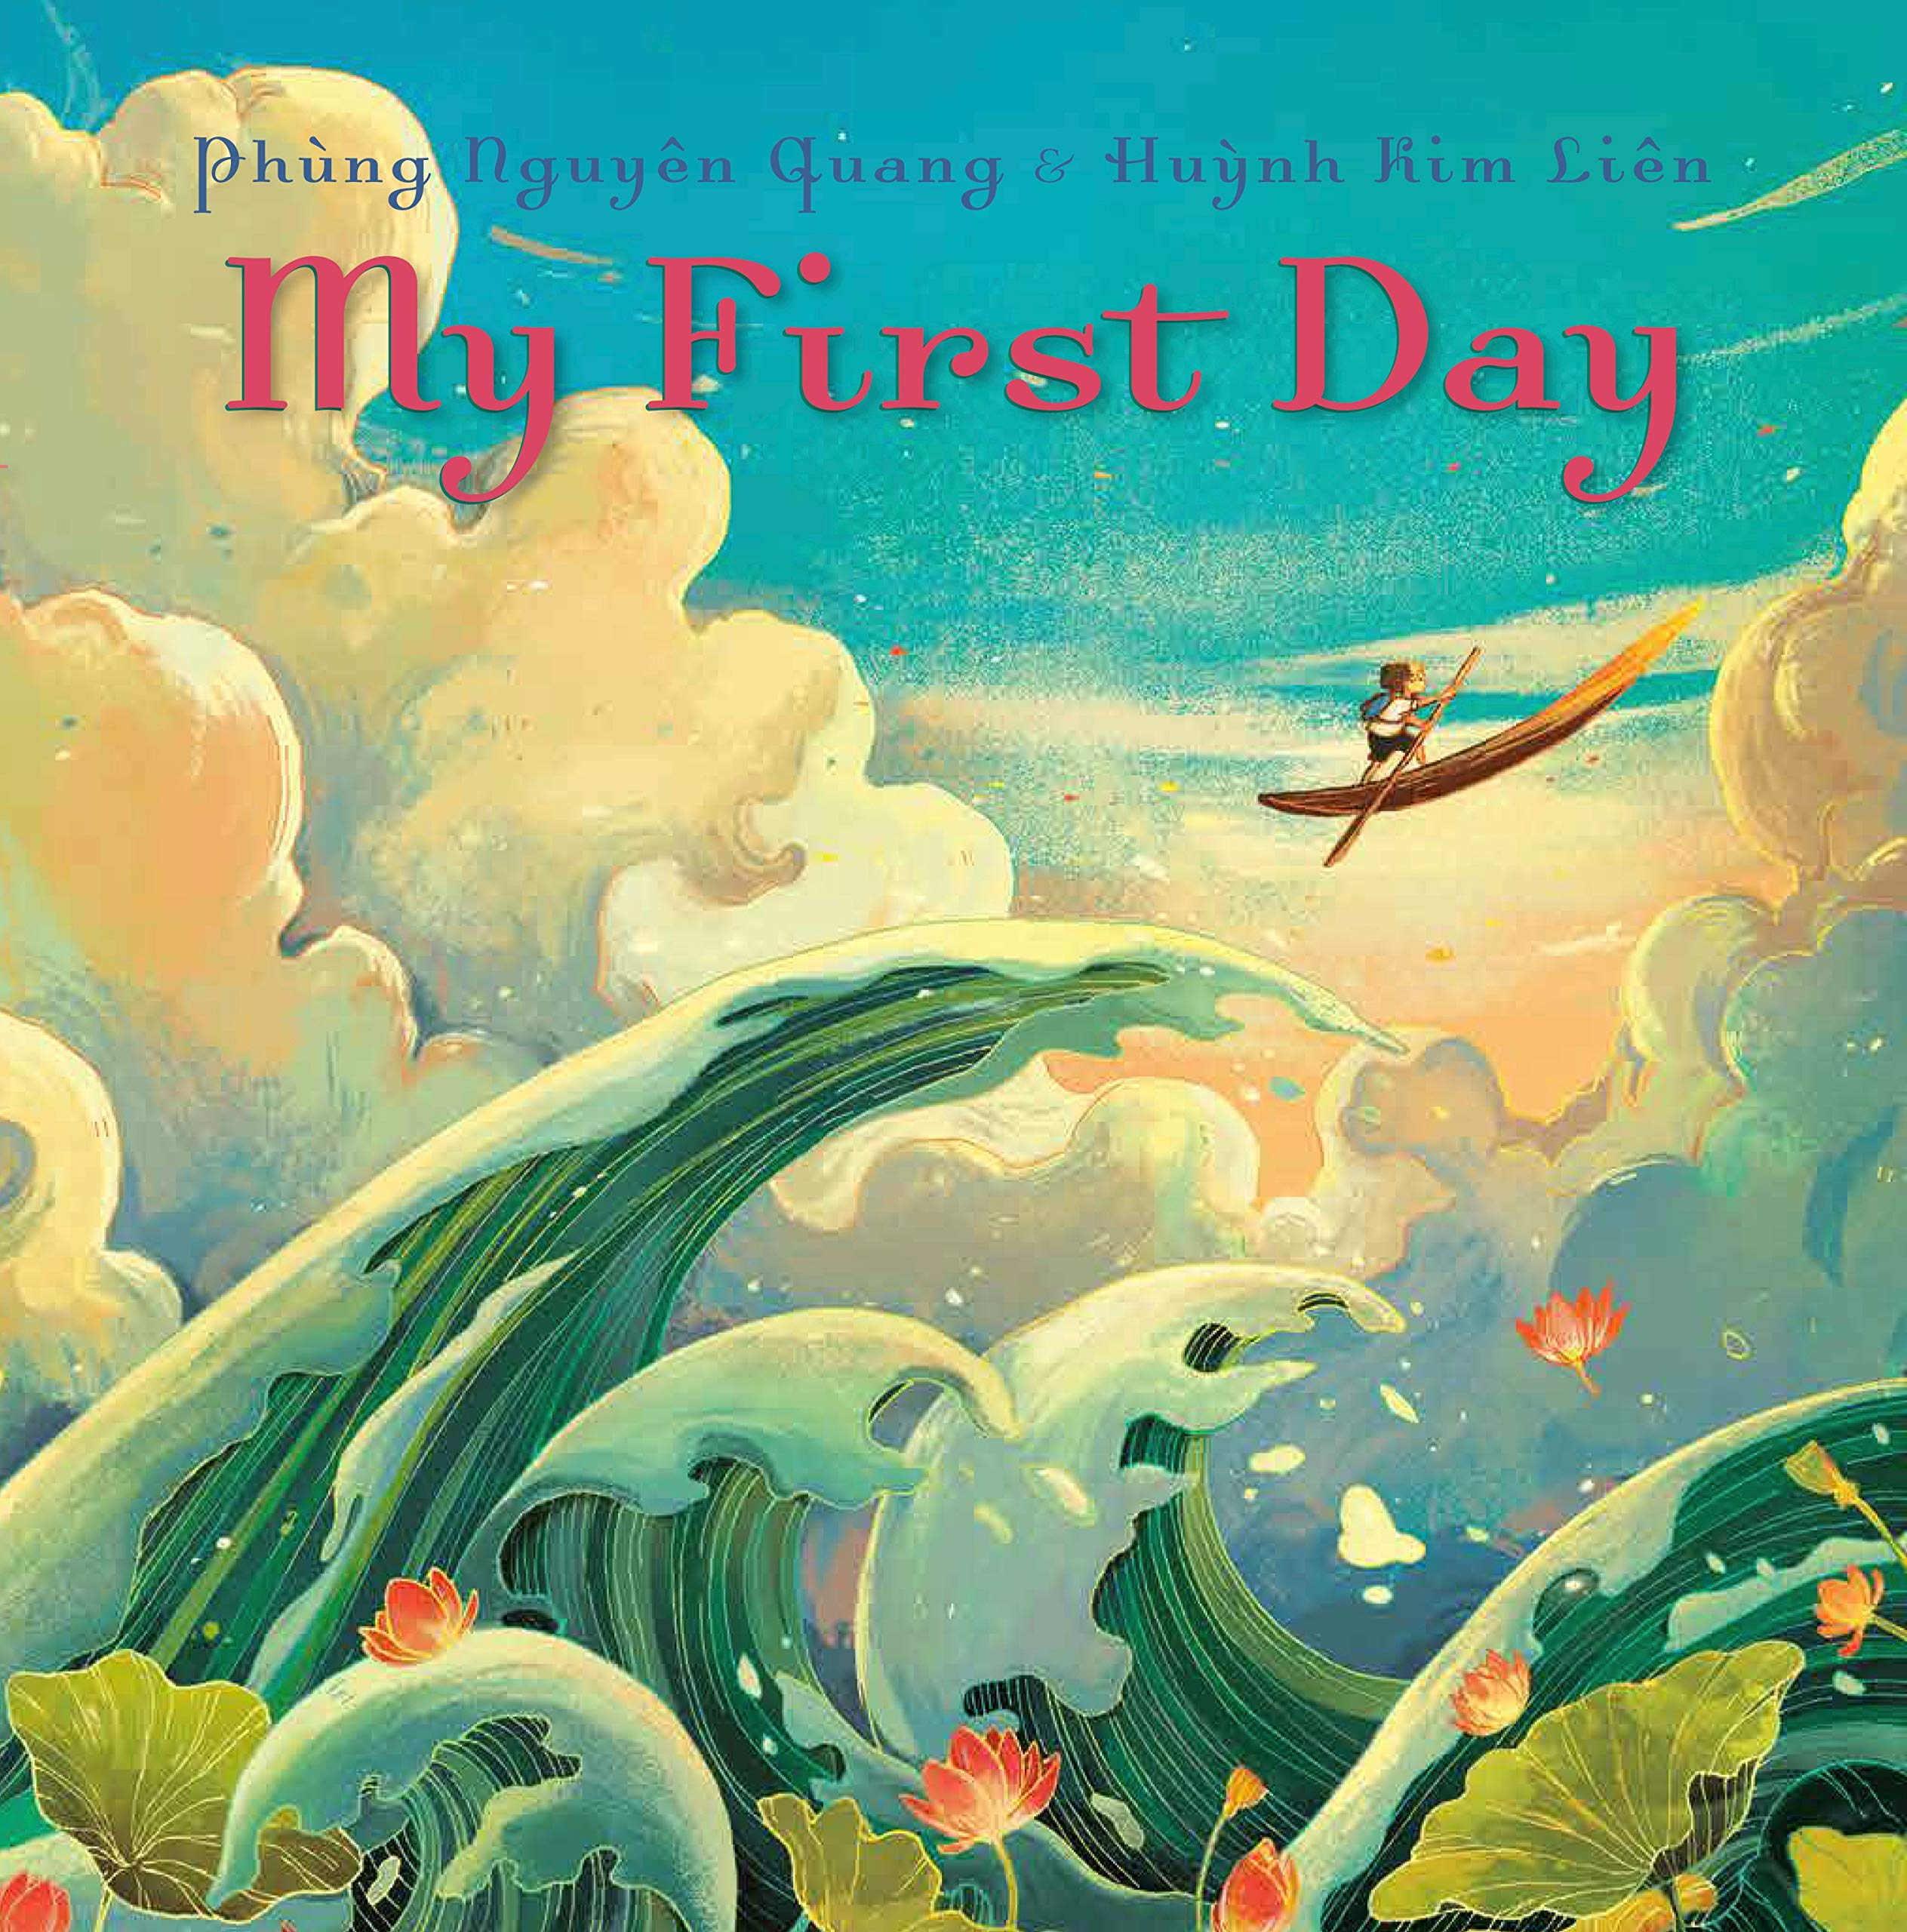 My First Day: Nguyen Quang, Phung, Kim Lien, Huynh: 9780593306260:  Amazon.com: Books